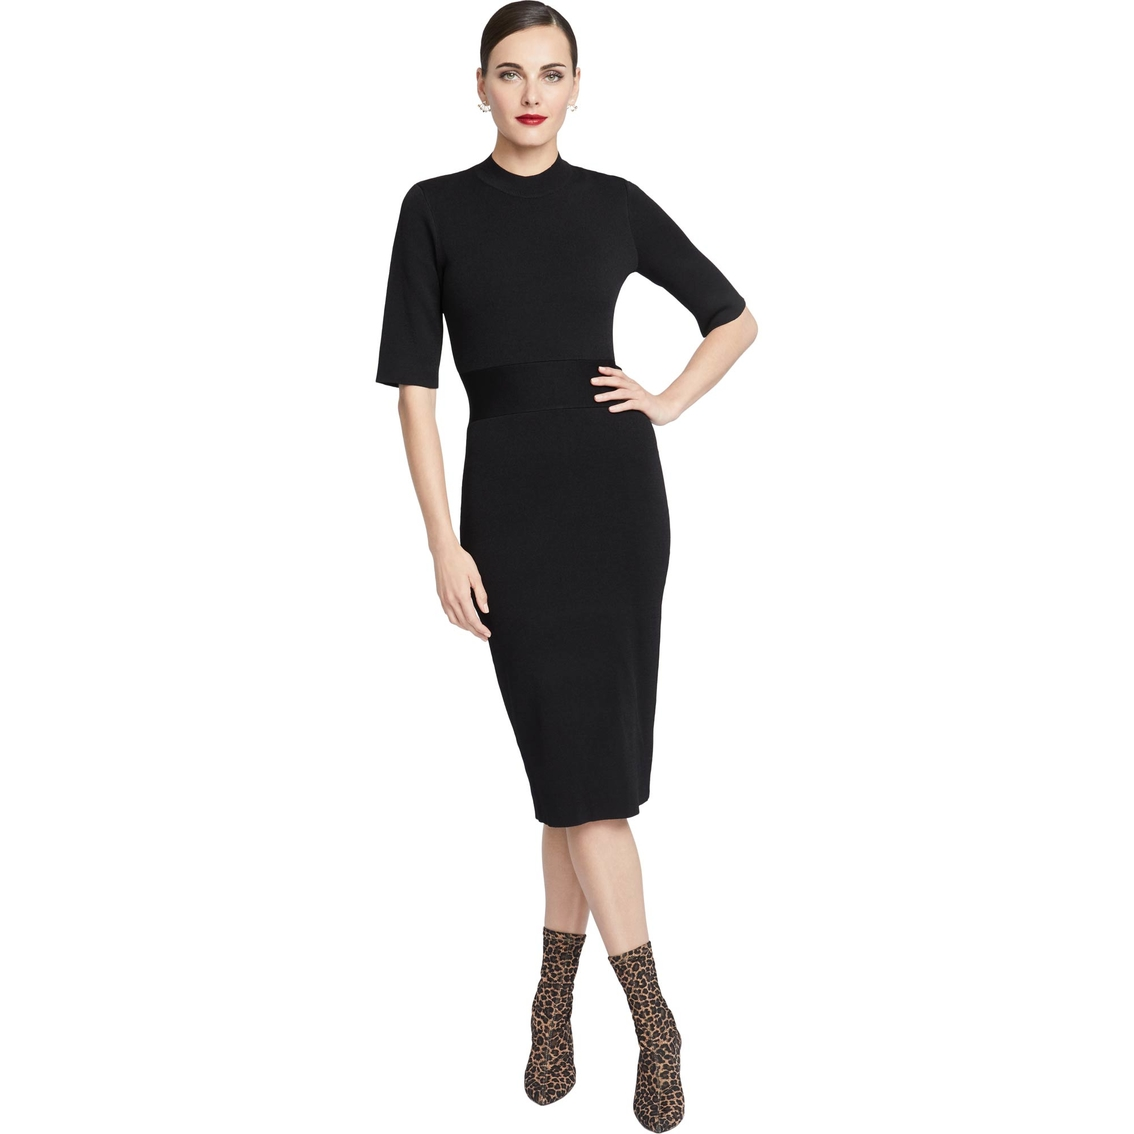 Rachel Roy Discount Gowns: Rachel Roy Megan Sweater Dress